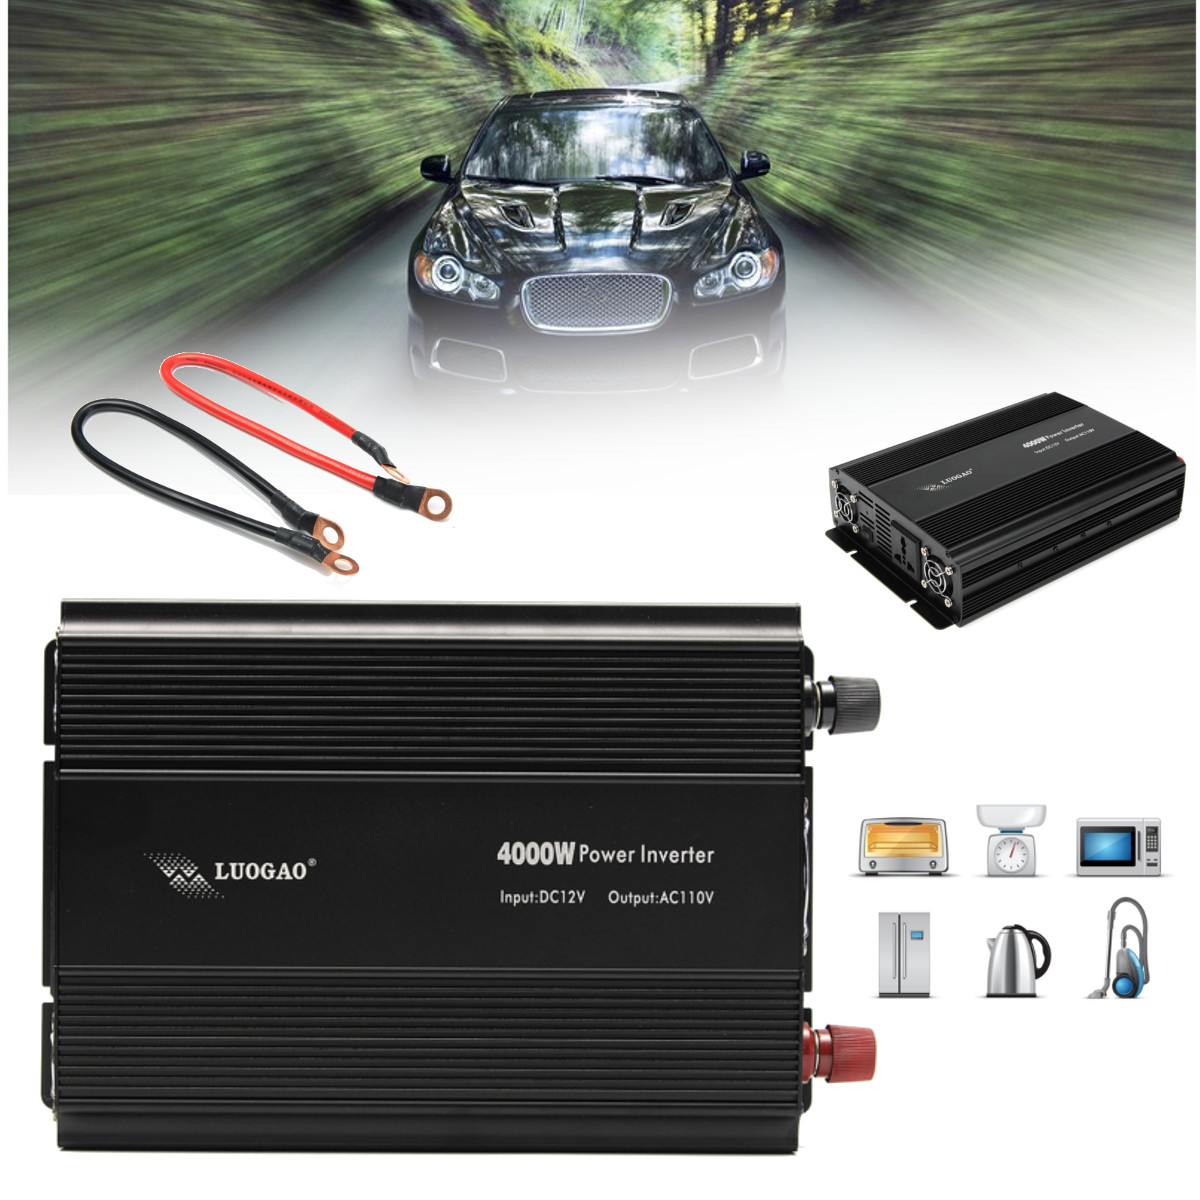 4000w 8000w Peak Modified Sine Wave Power Inverter Dc 12v To Ac 110v Design Code For Converter